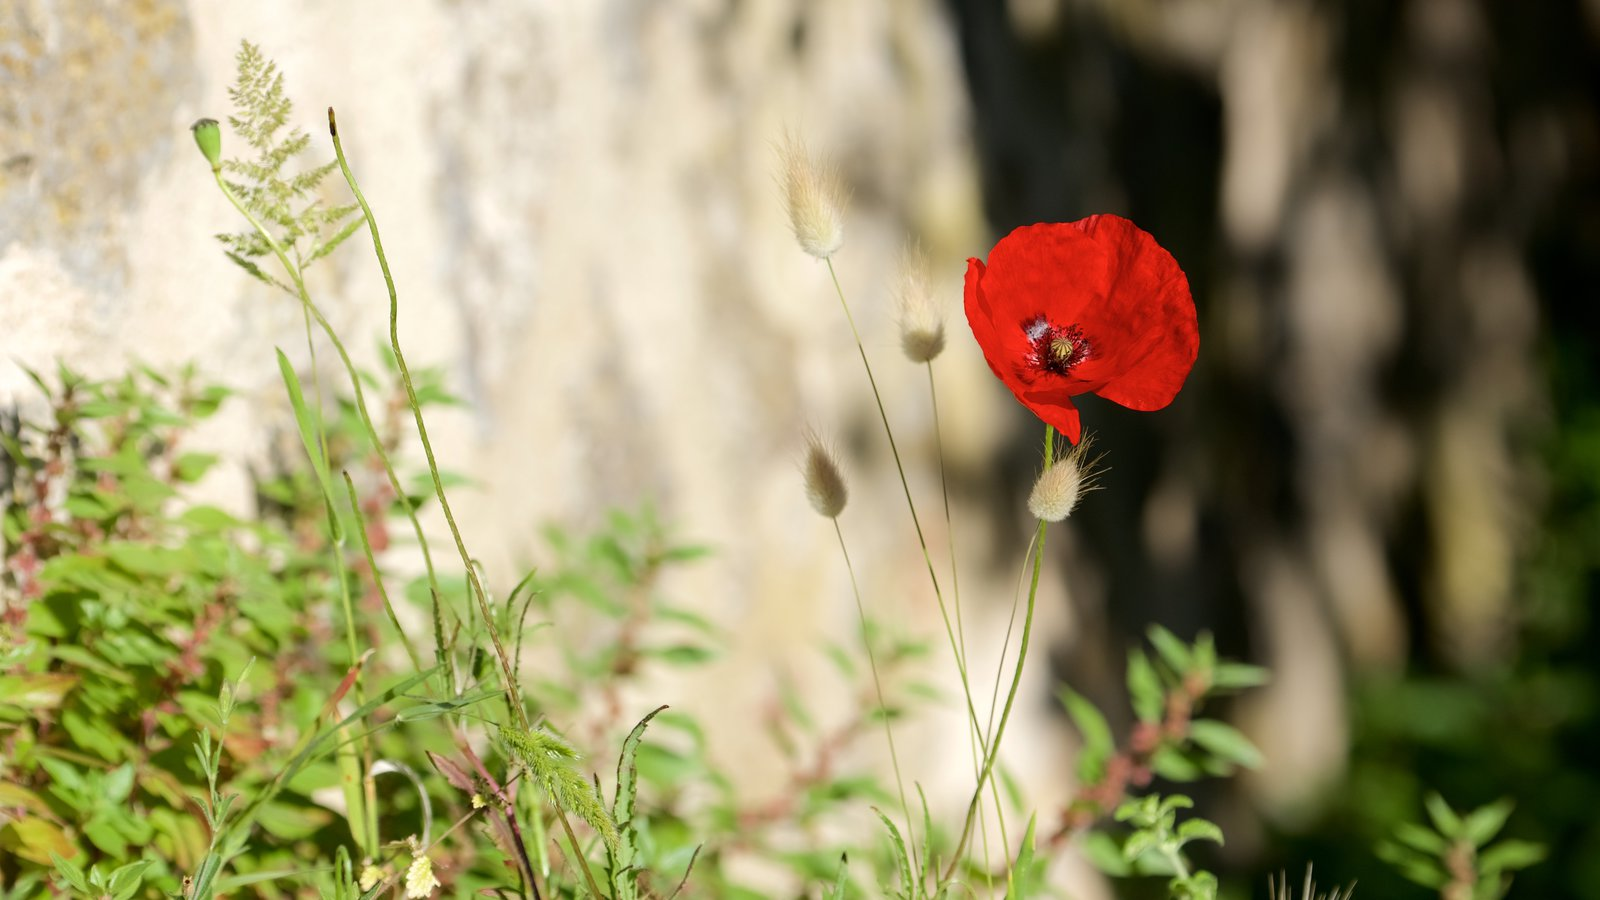 Talamone caracterizando flores